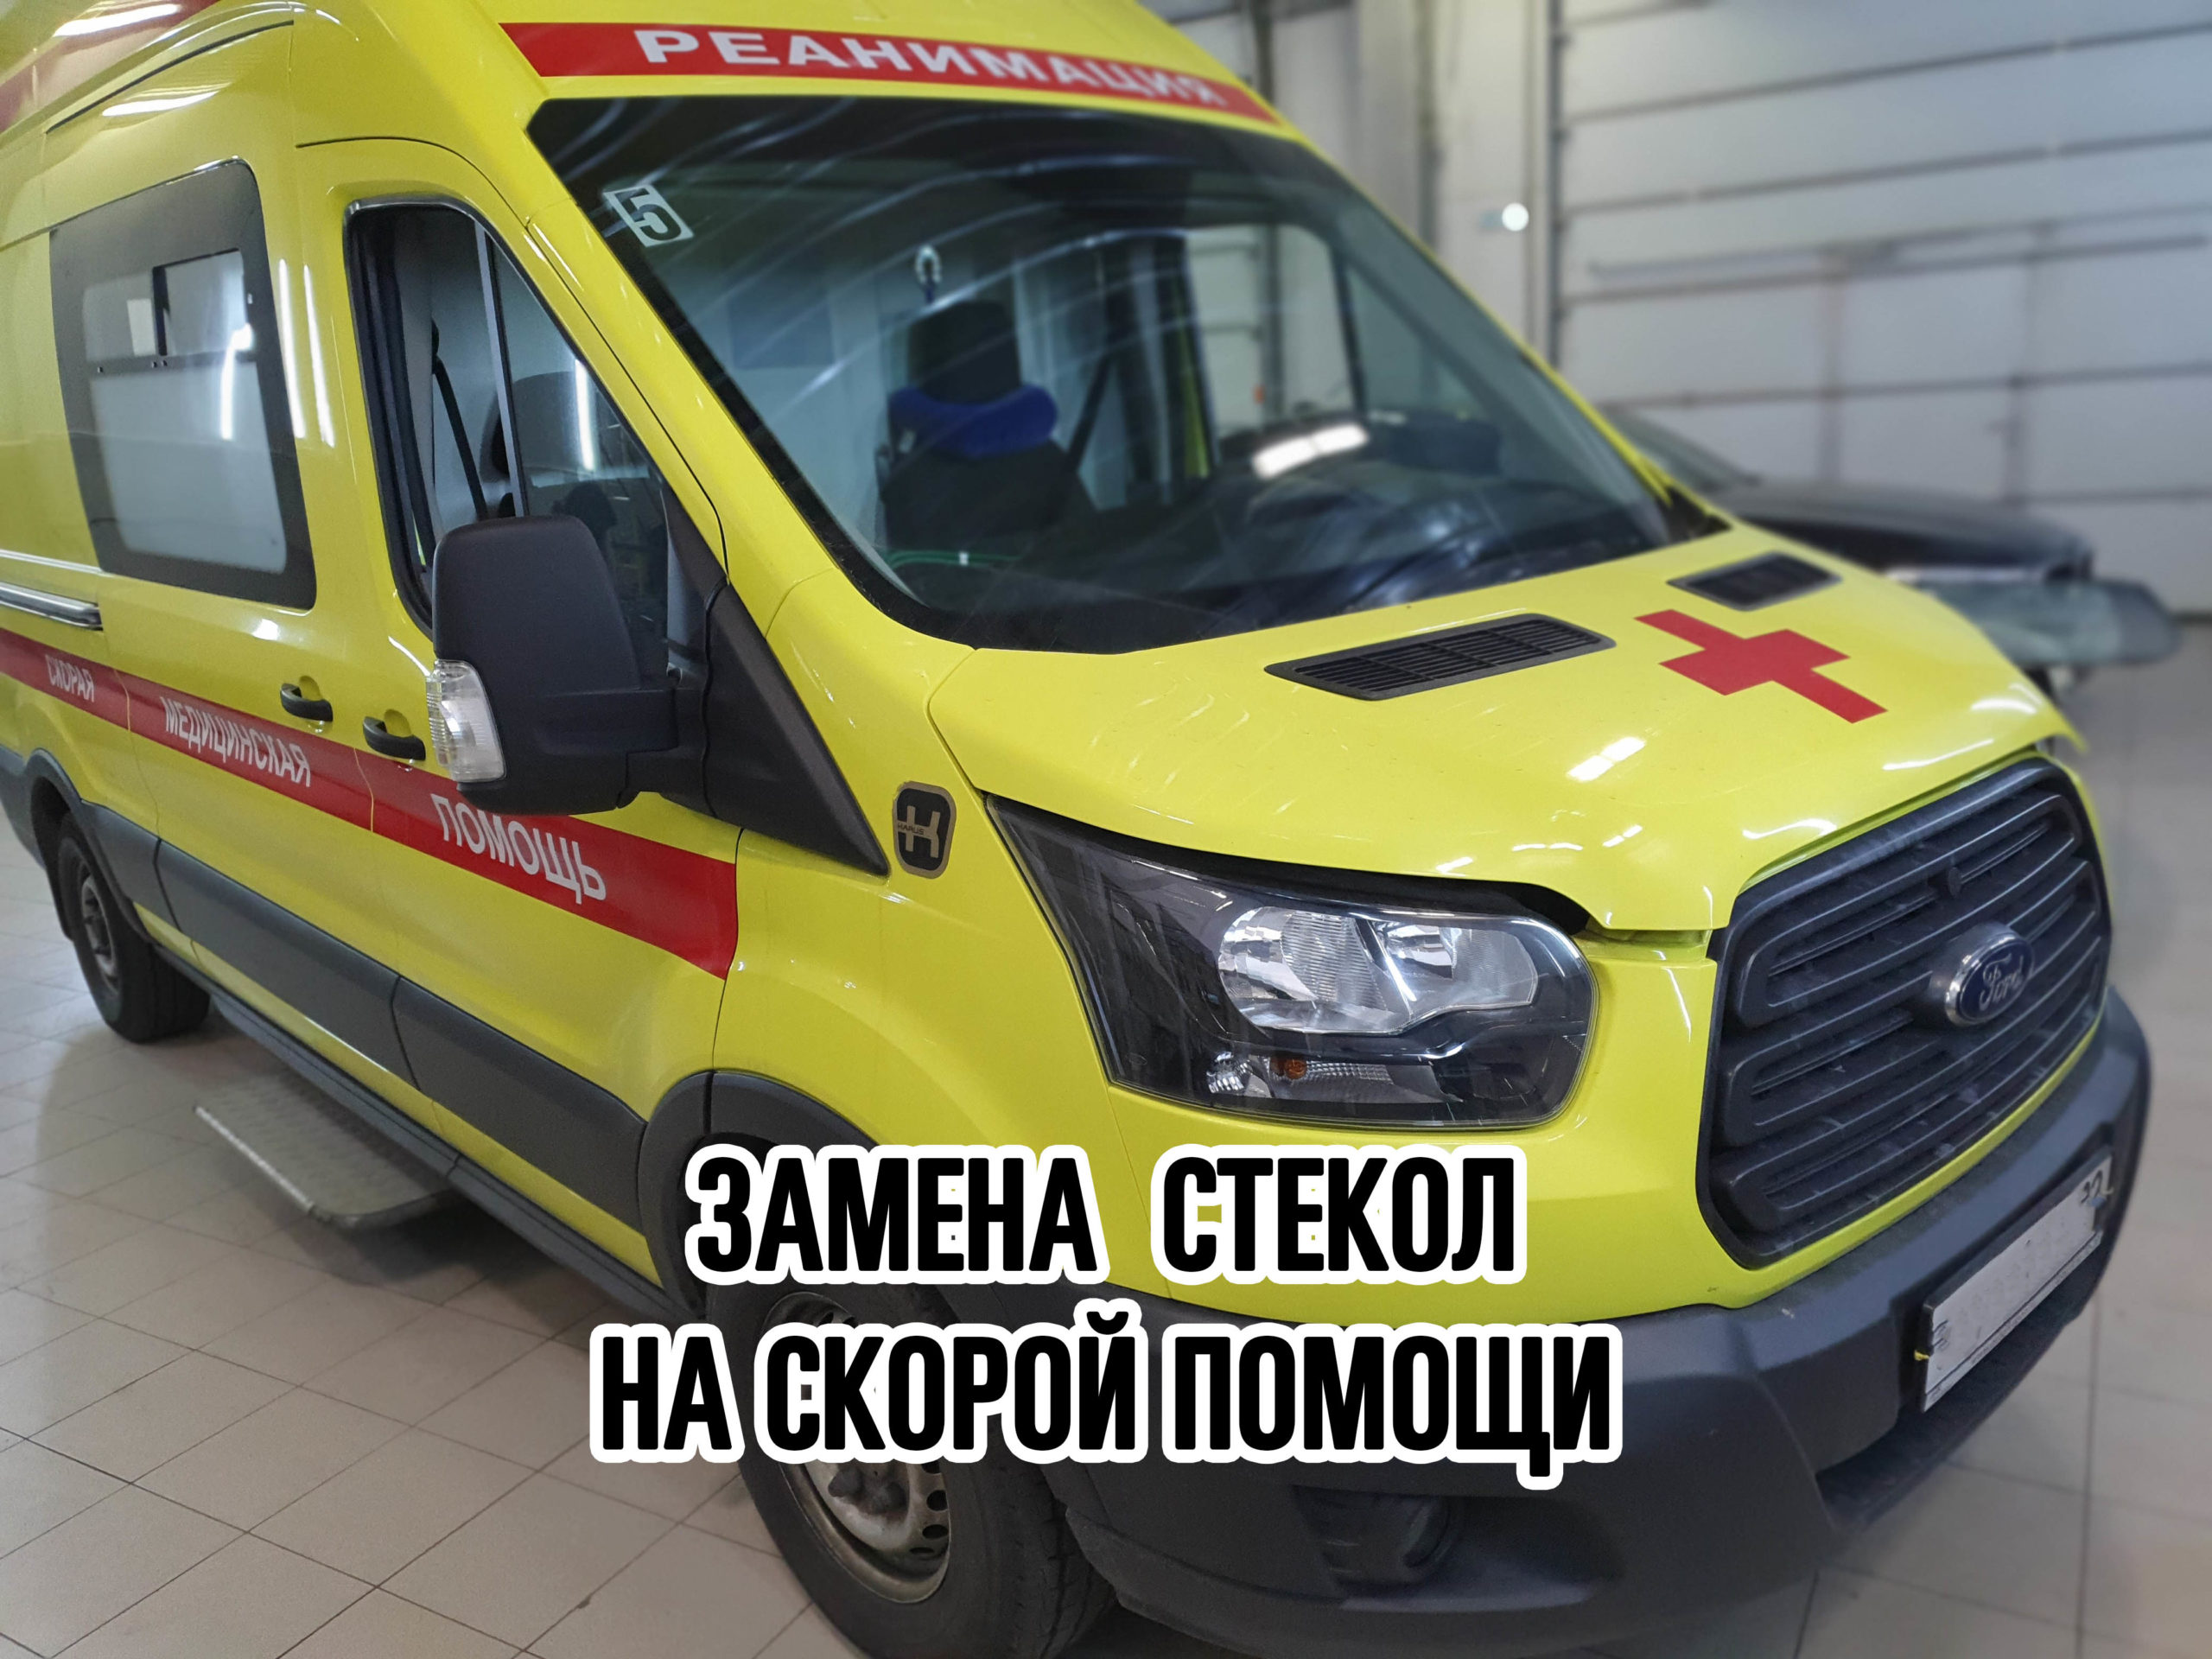 Замена стекол на скорой помощи в Москве